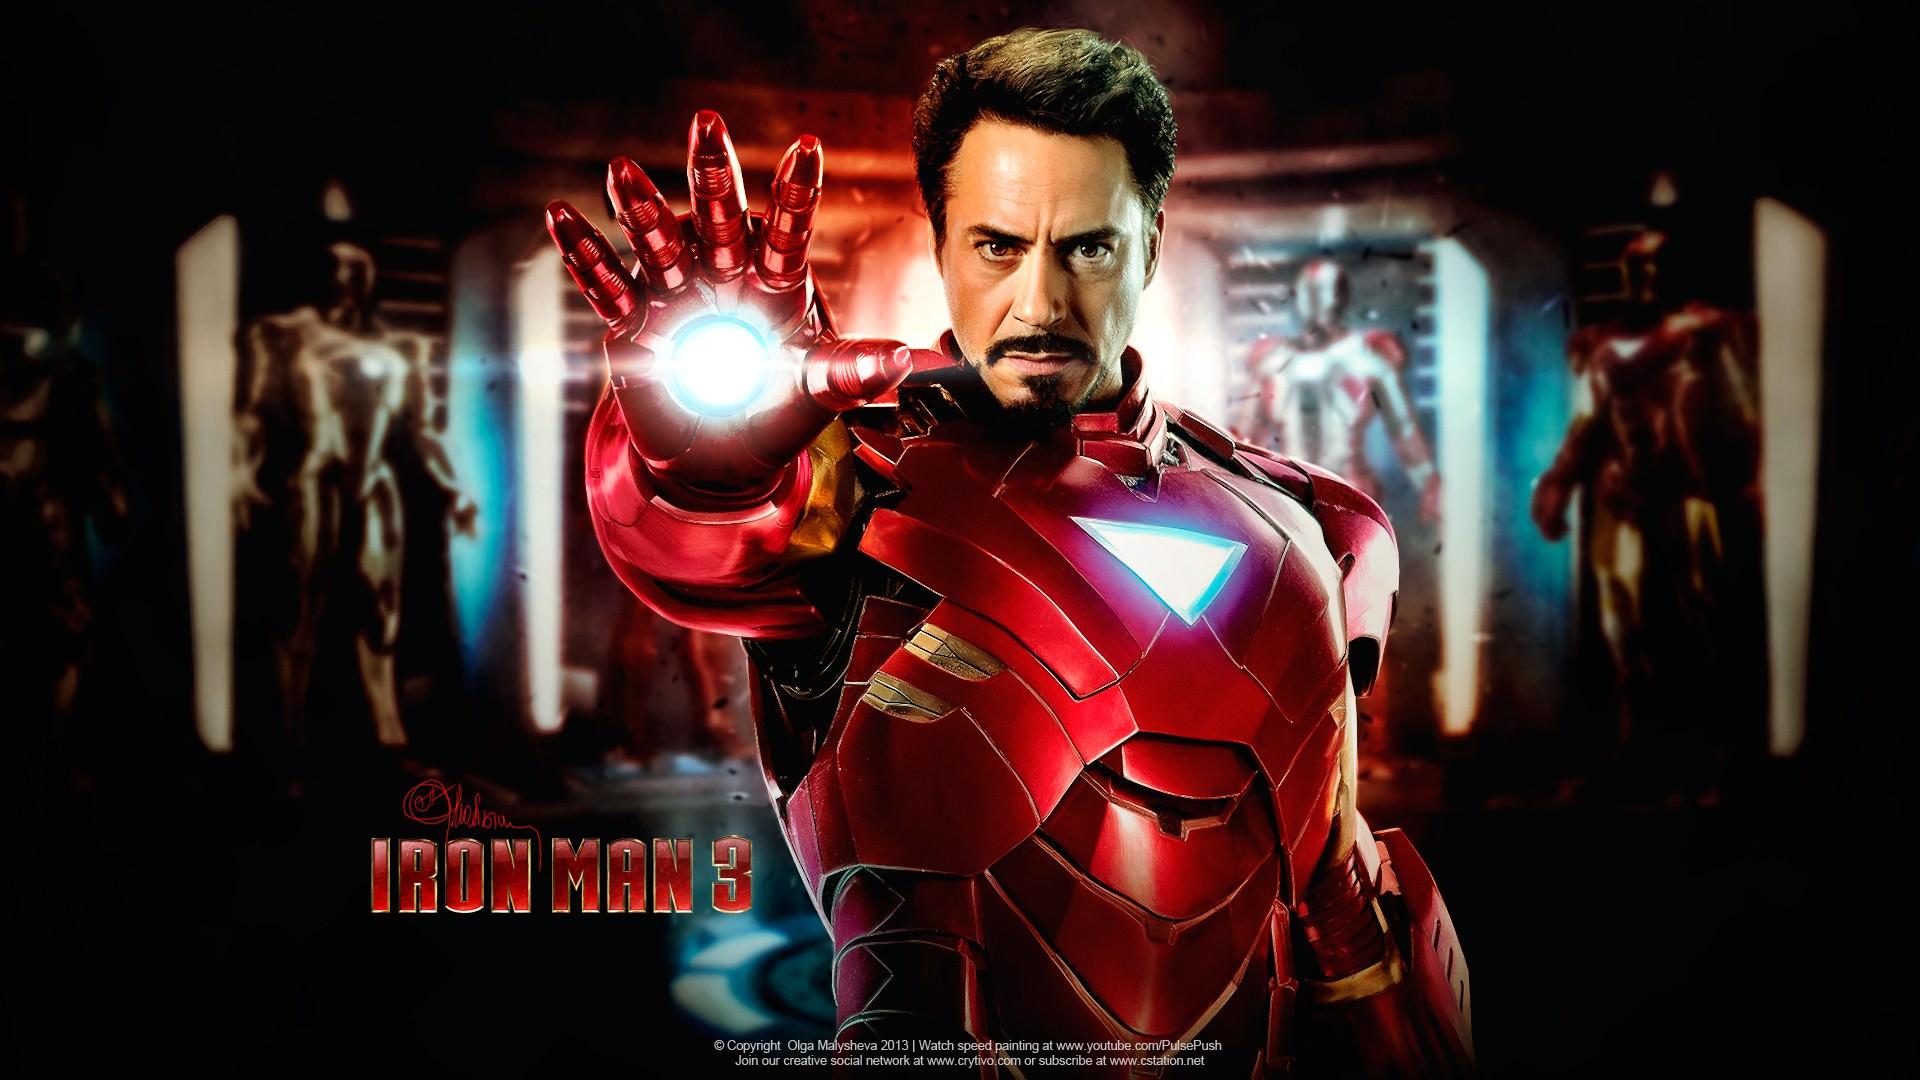 Tony Stark 4k Wallpaper: [電影] 鋼鐵人3 (Iron Man 3) 最終回完結篇影評?? 高畫質桌布打包下載收藏